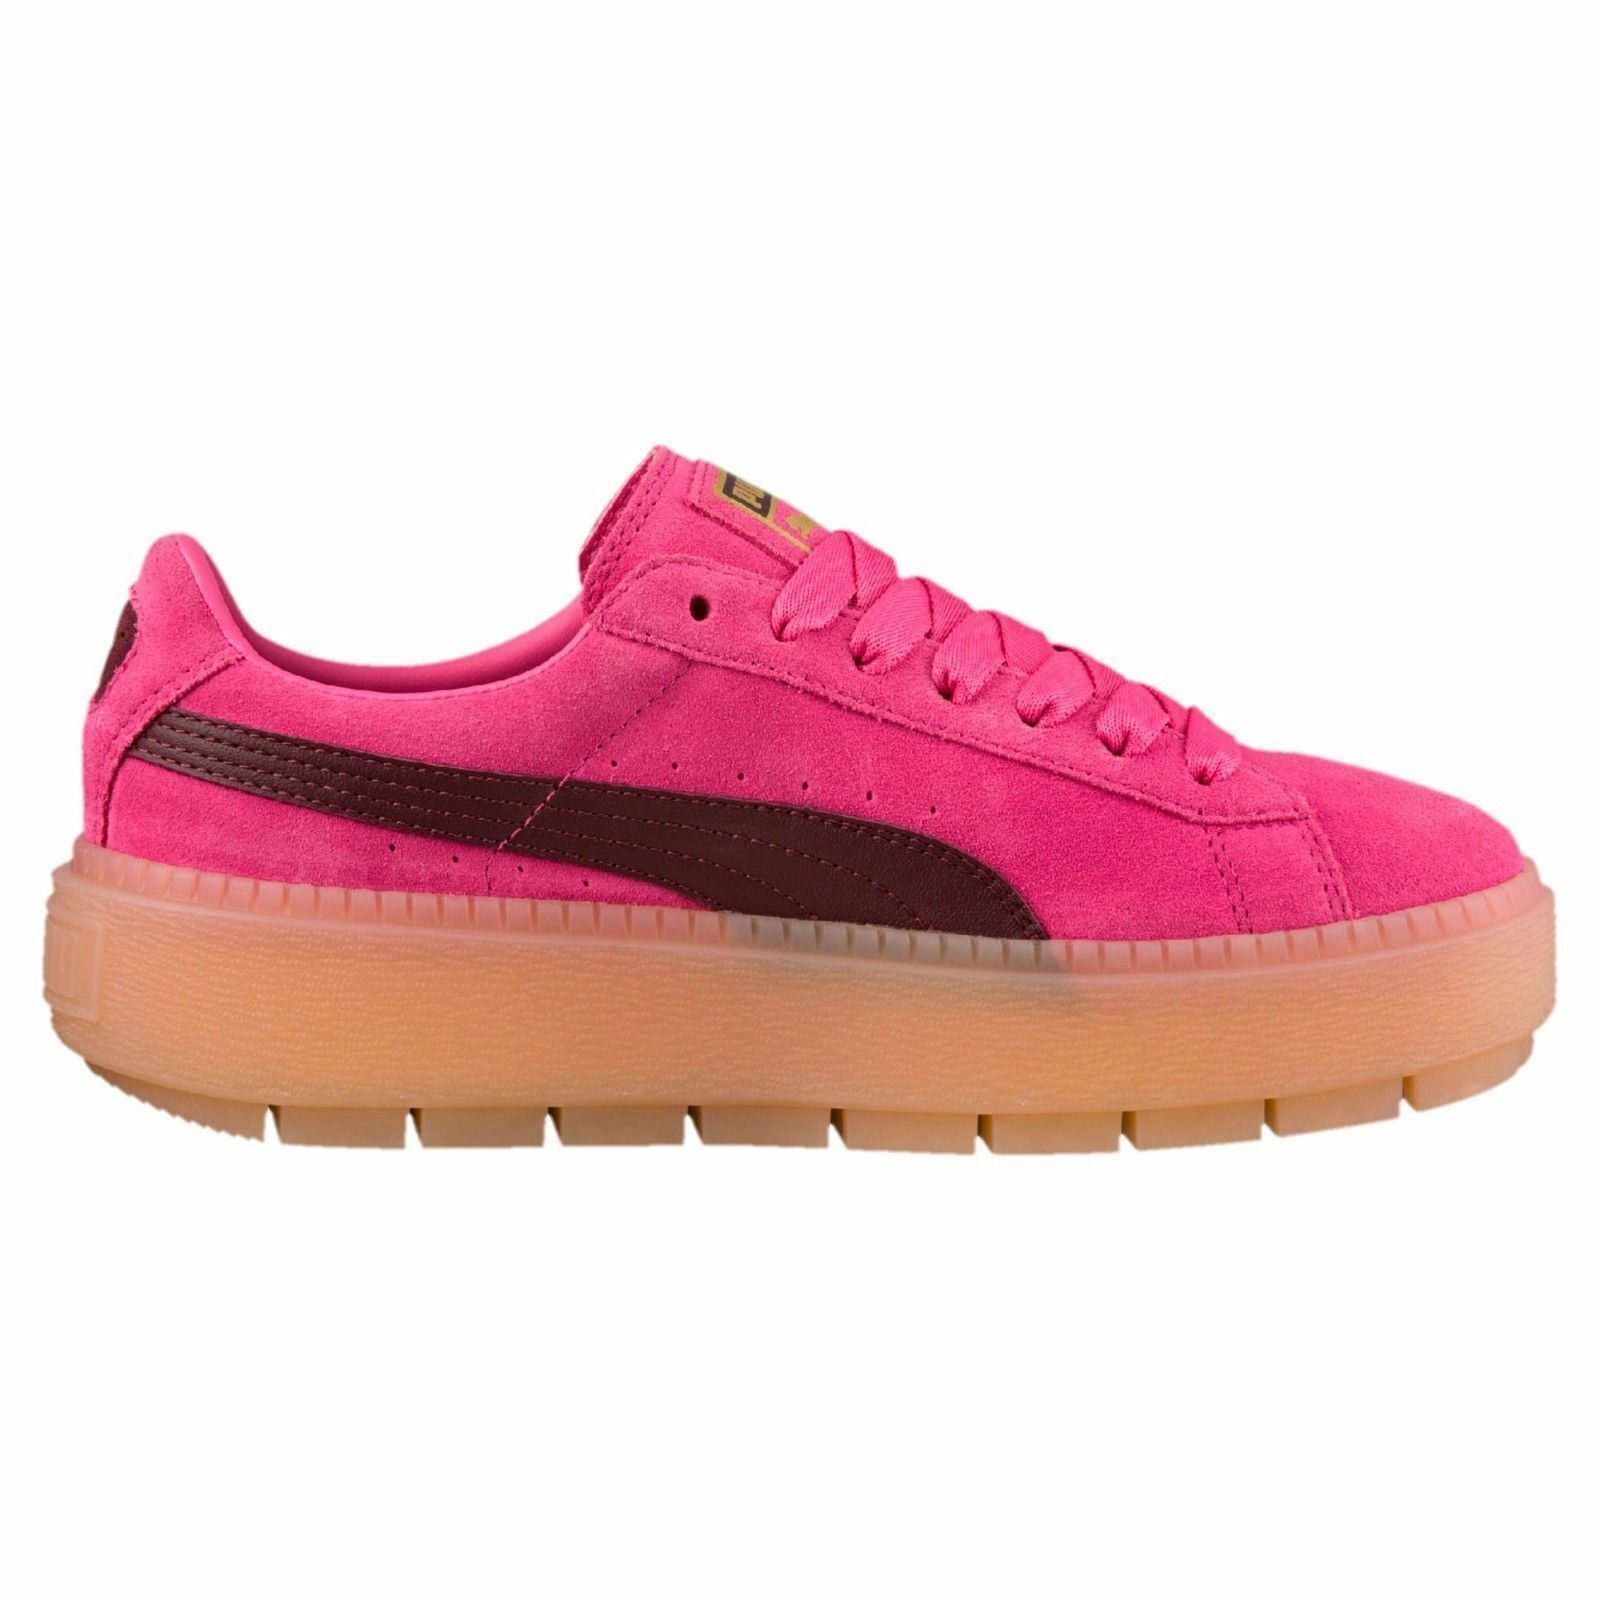 0e5497198345 PUMA Platformtraceblock Women s Casual Trainers Pink 36 for sale ...